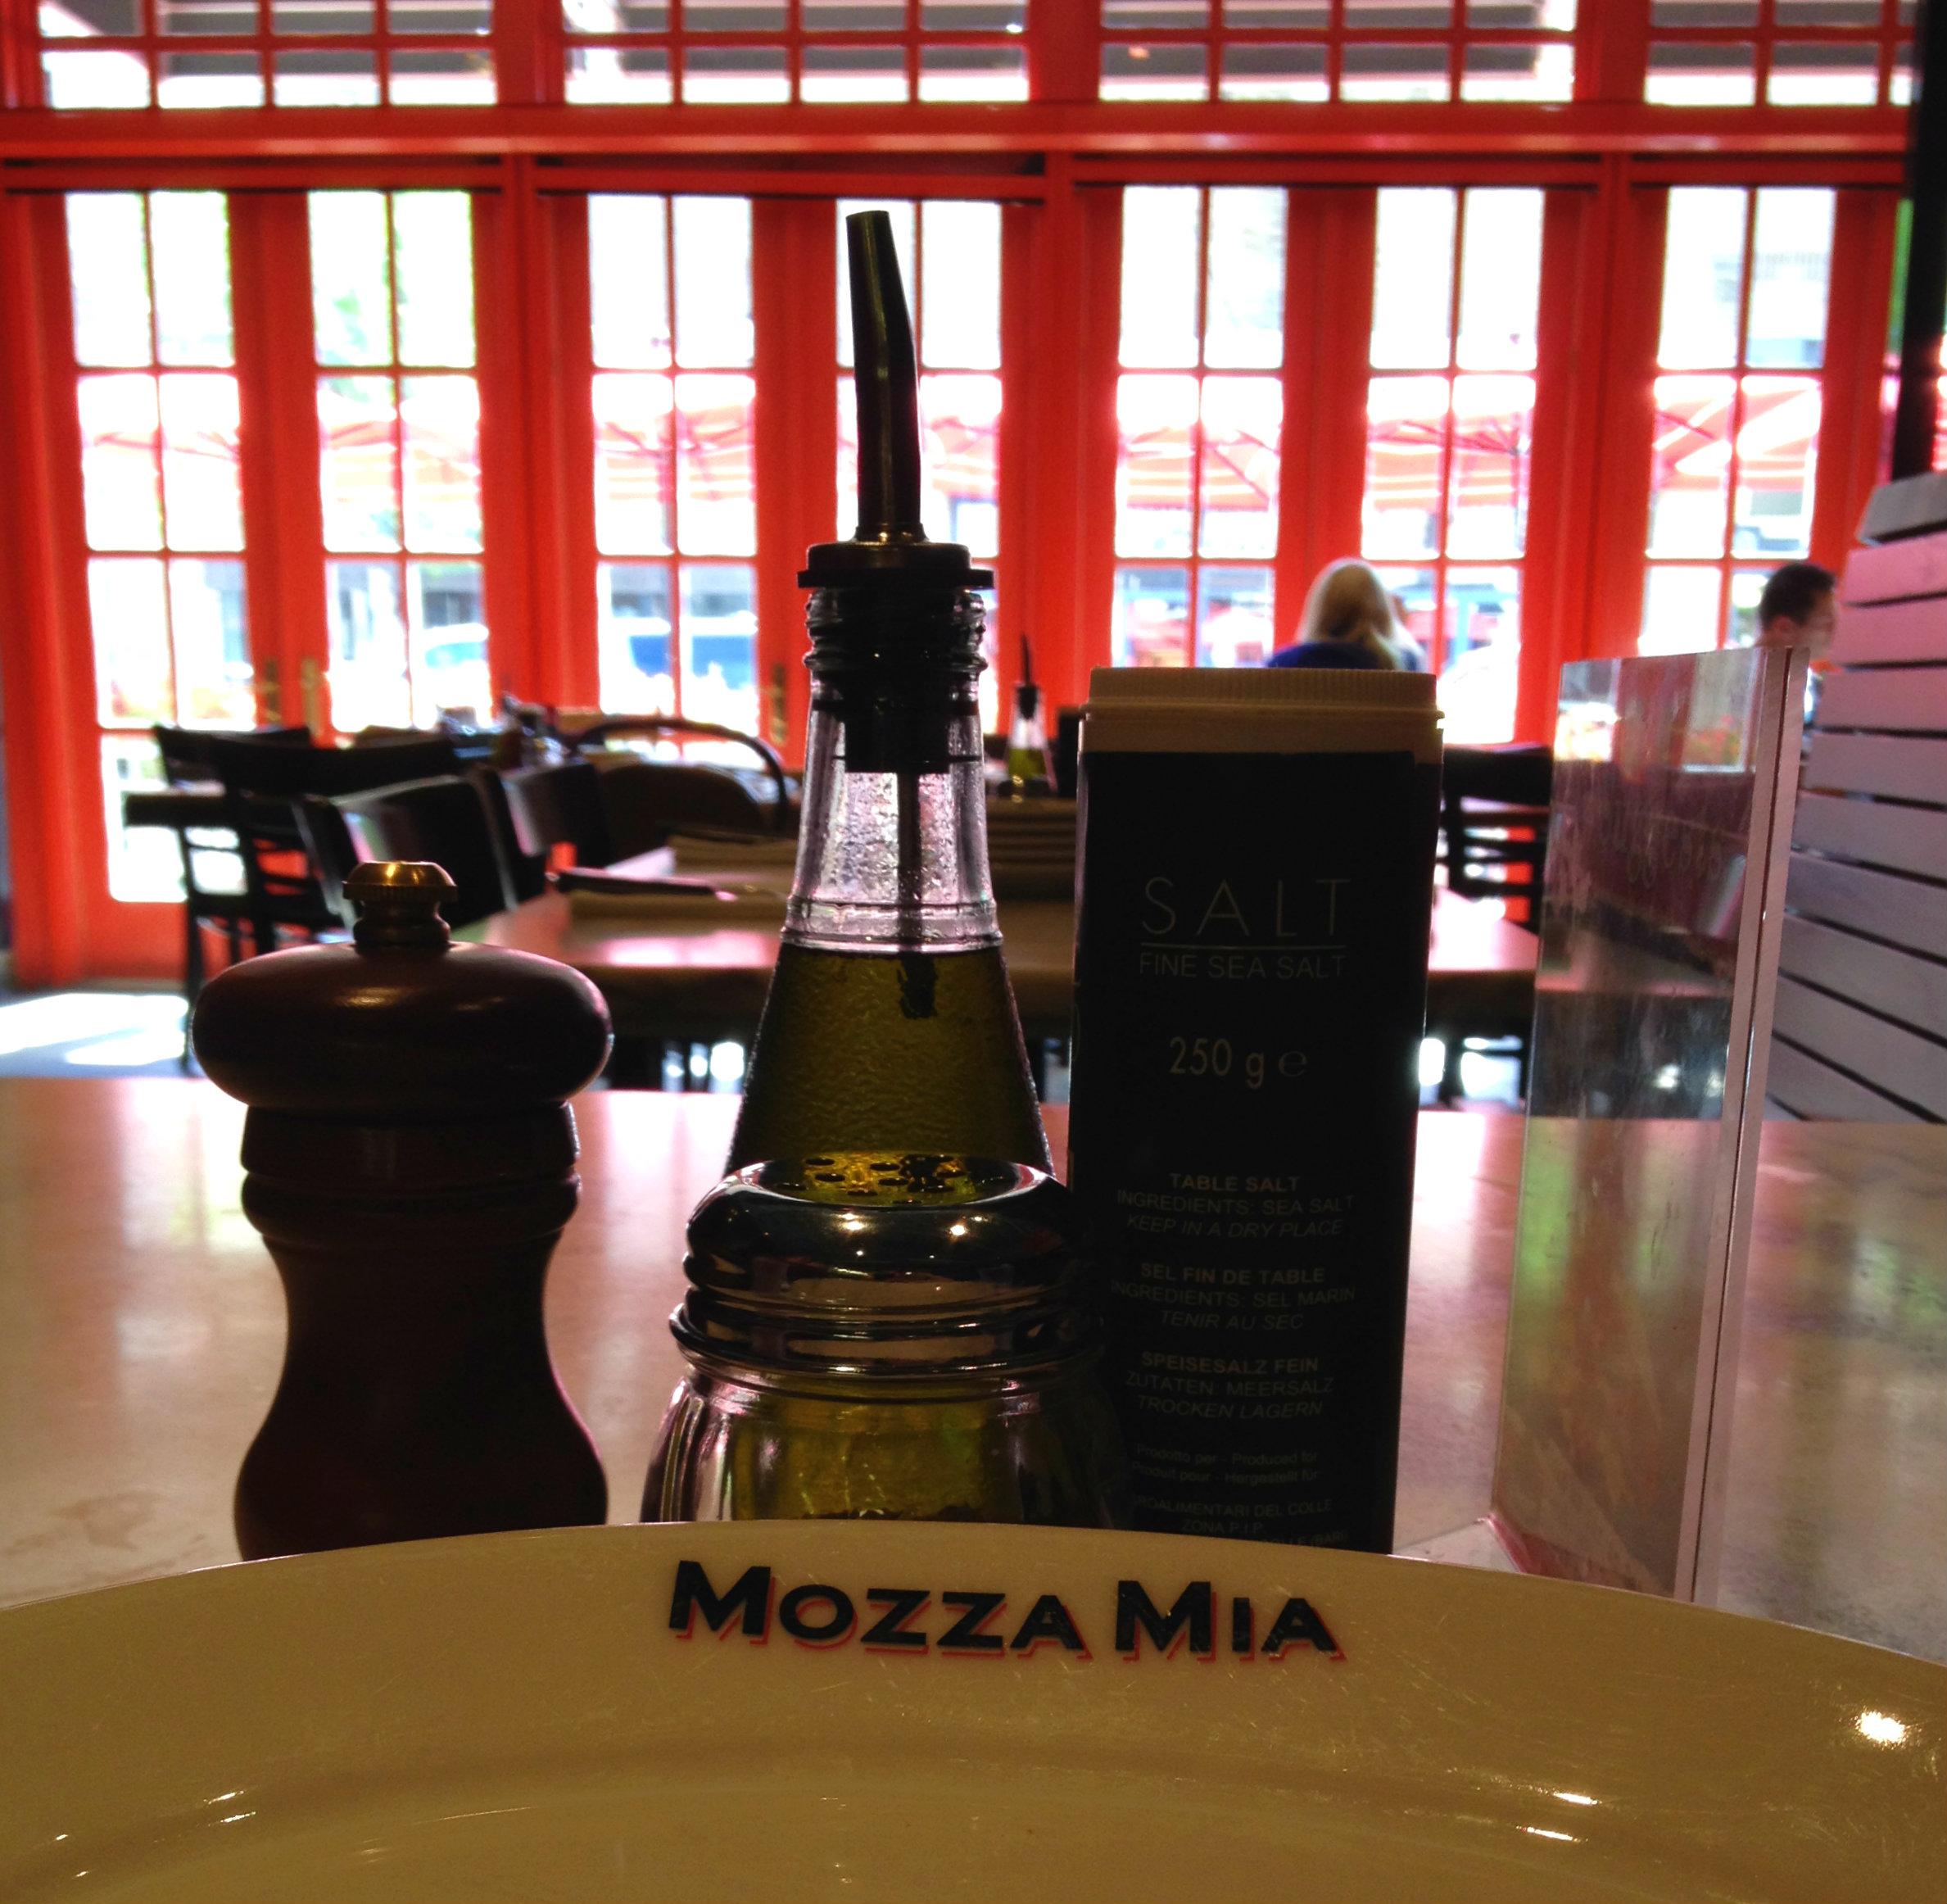 Mozza Mia in Edina Minnesota